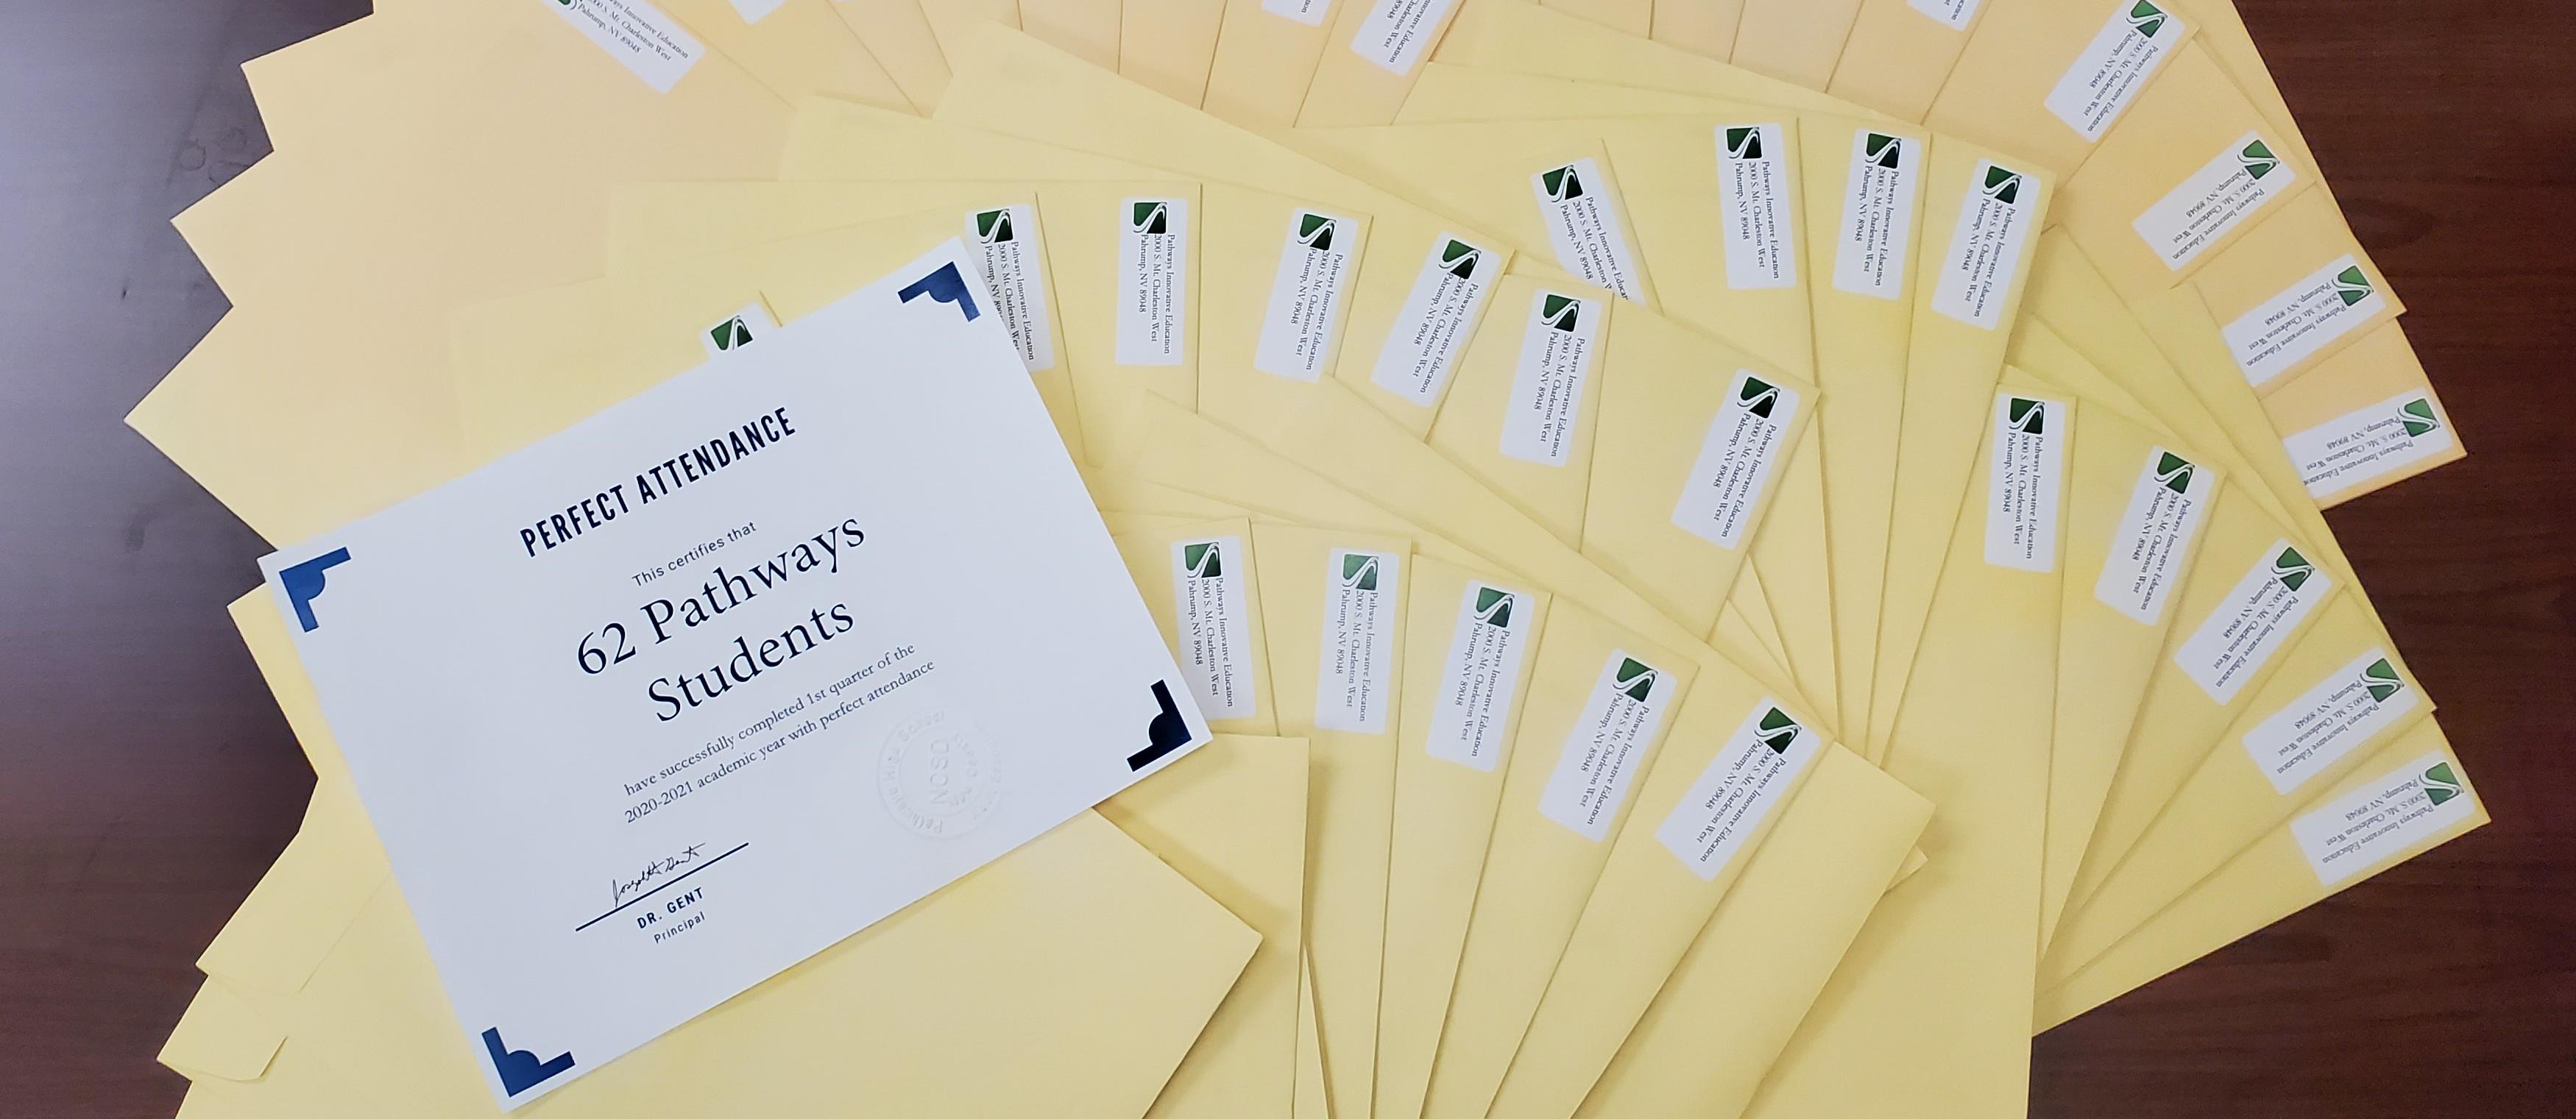 Pathways Perfect Attendance Certificates